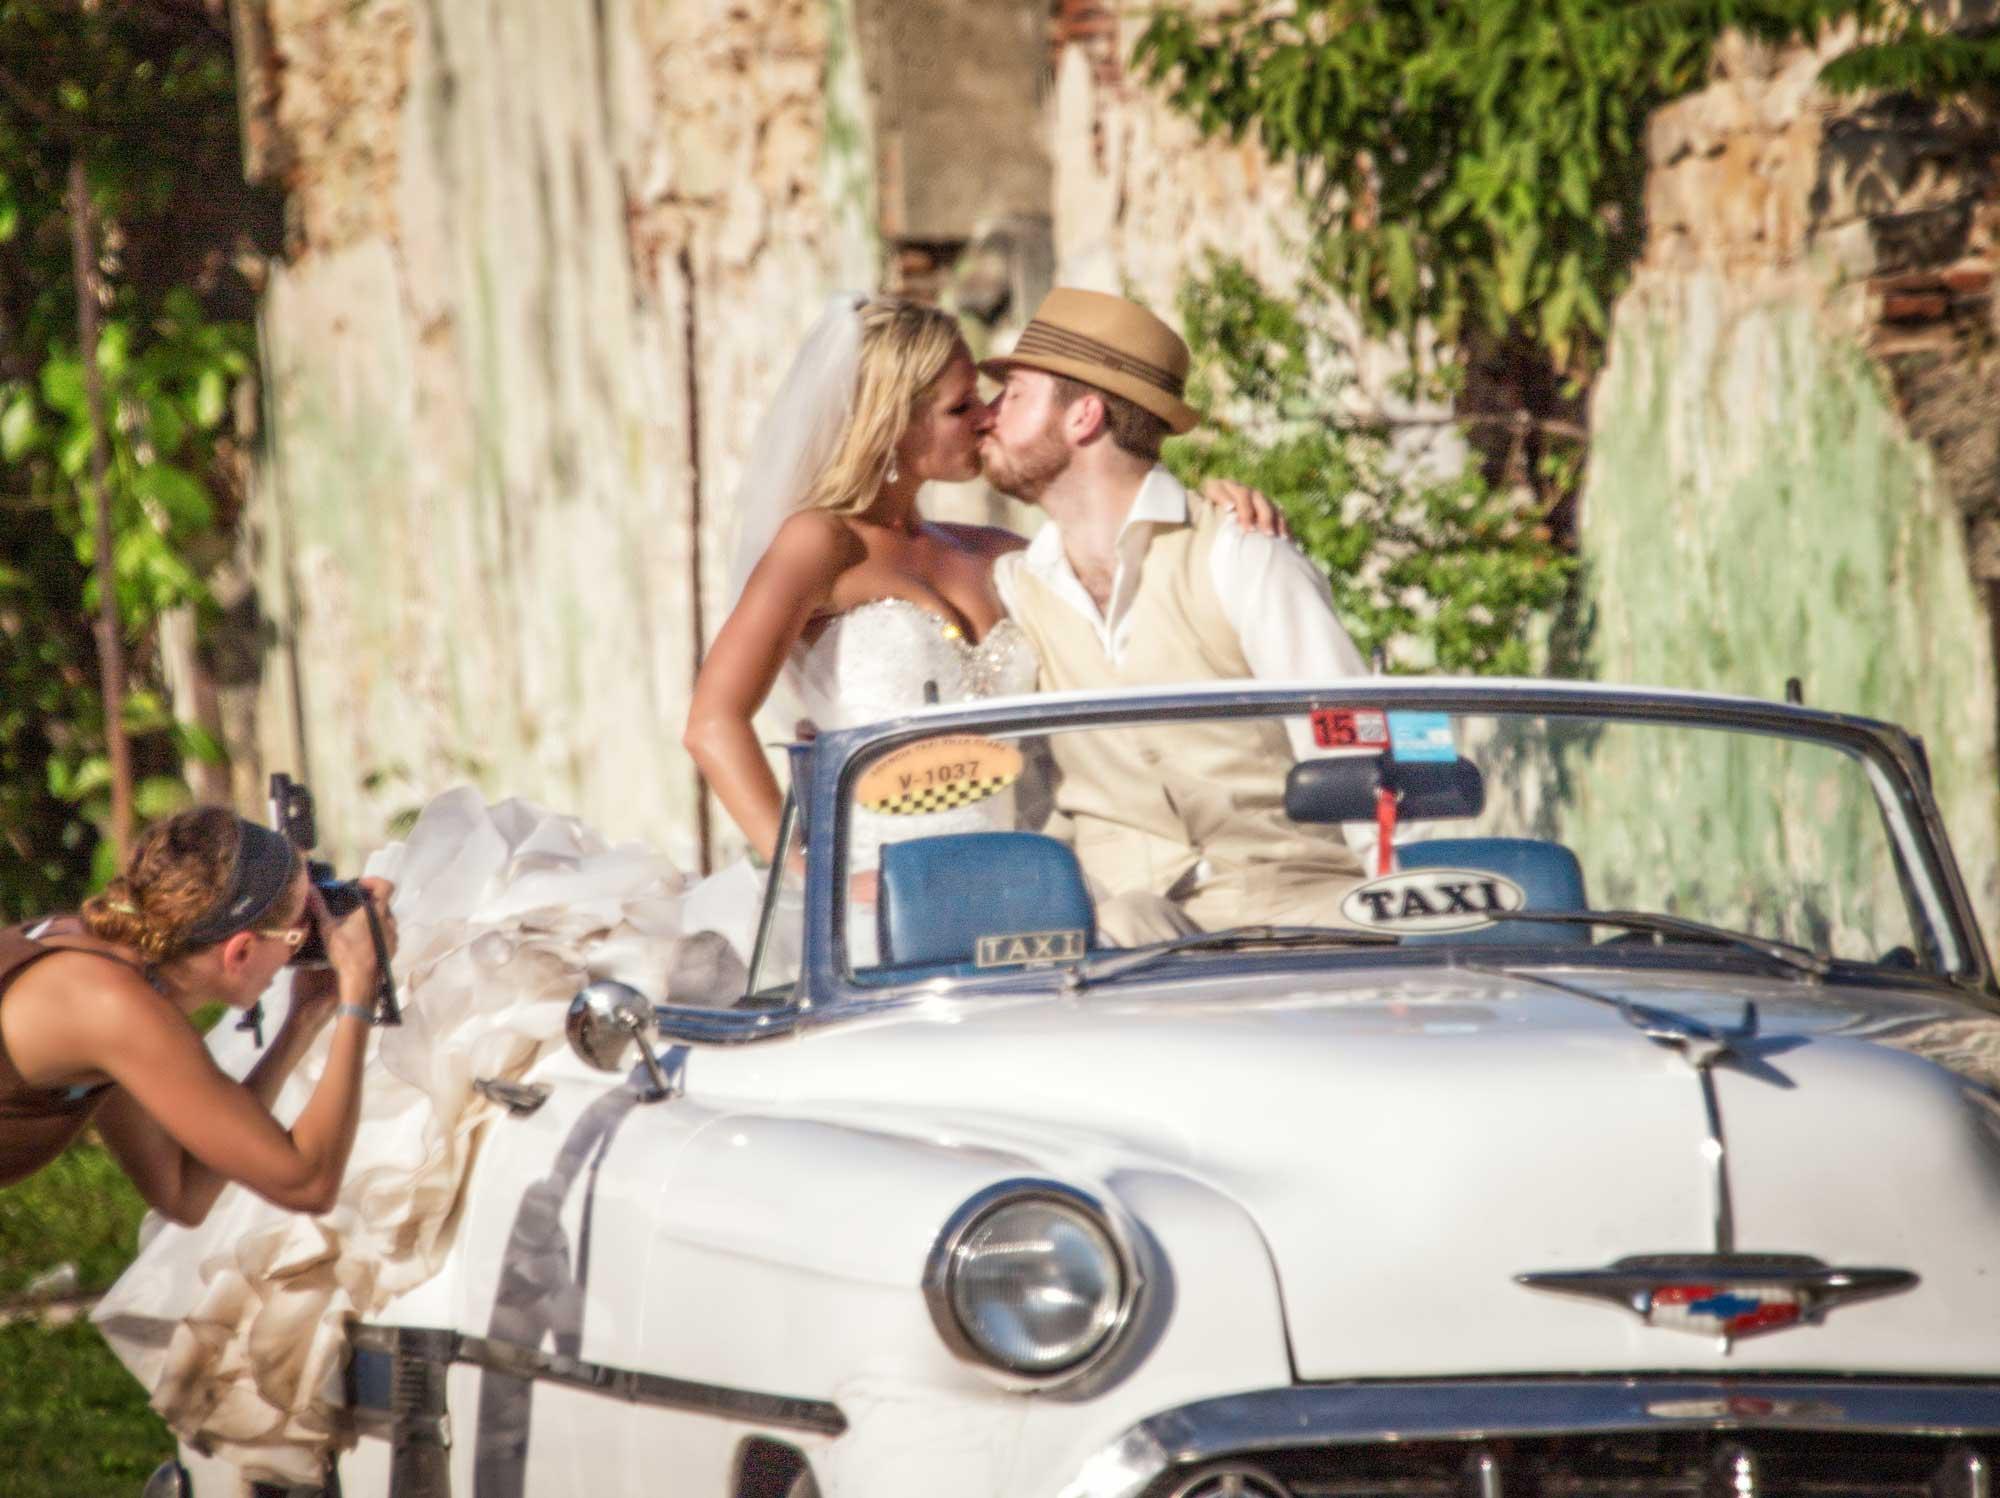 Destination Wedding photographers, Troy & Shirleen Burnett on location in Cuba